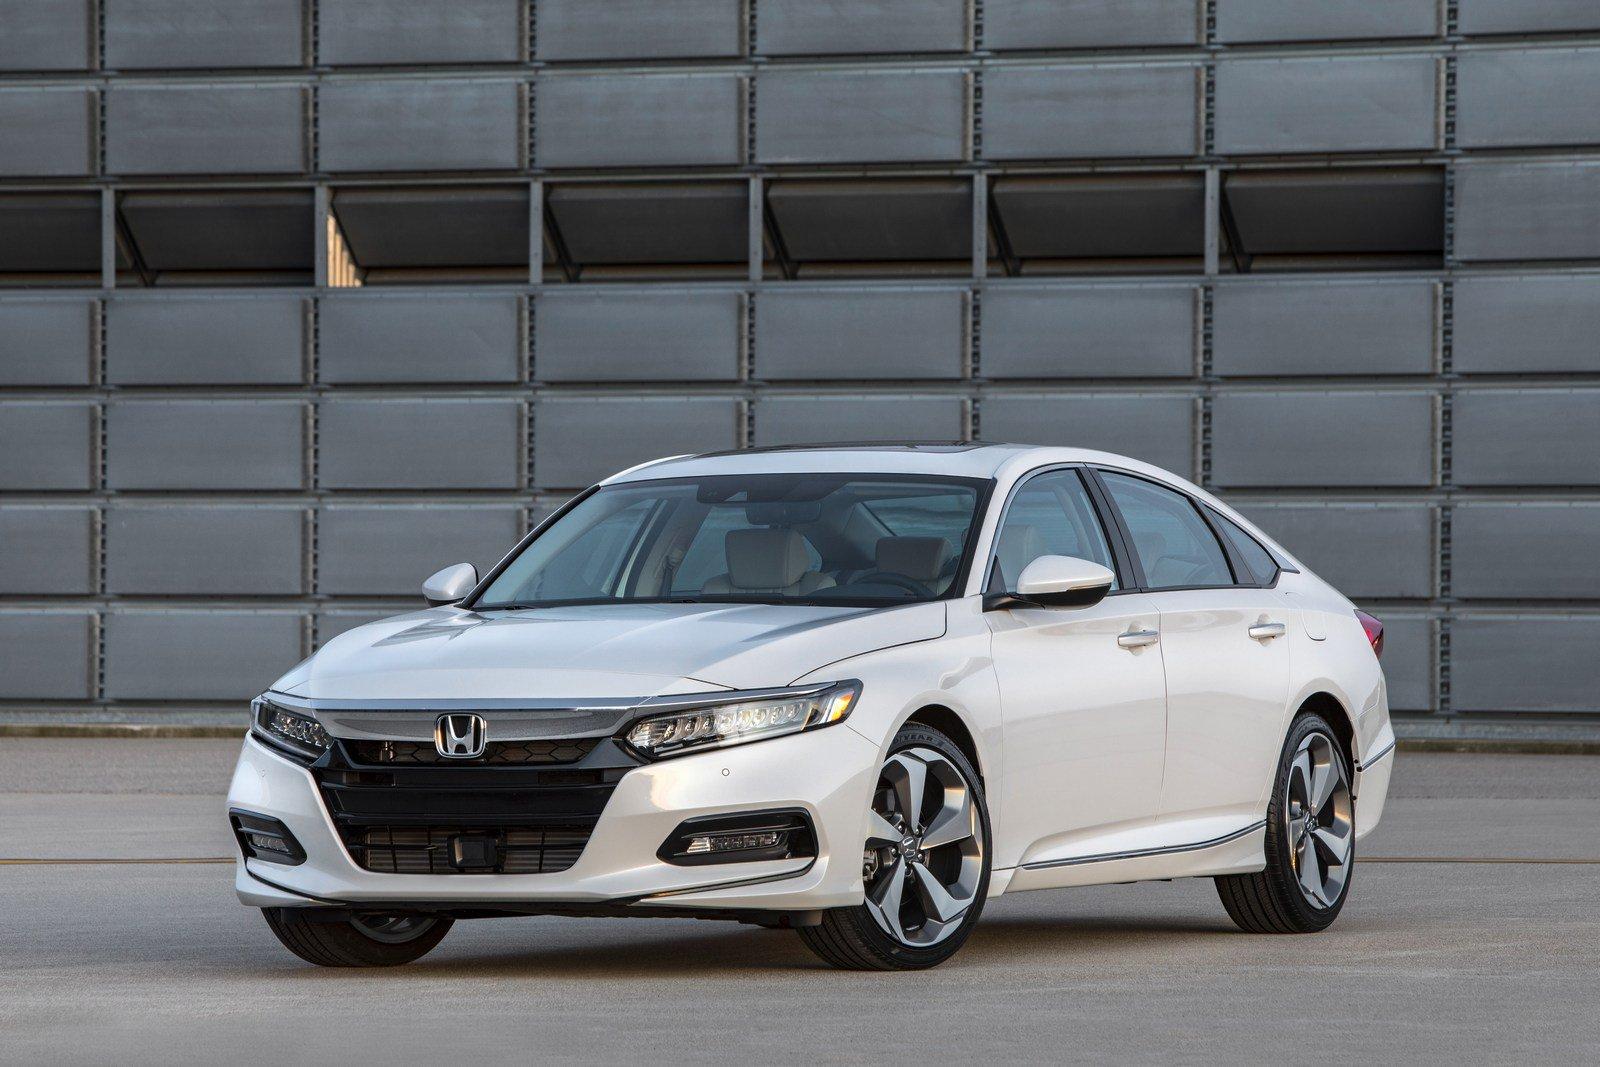 top-10-sedan-ban-chay-2018-honda-accord-1.jpg